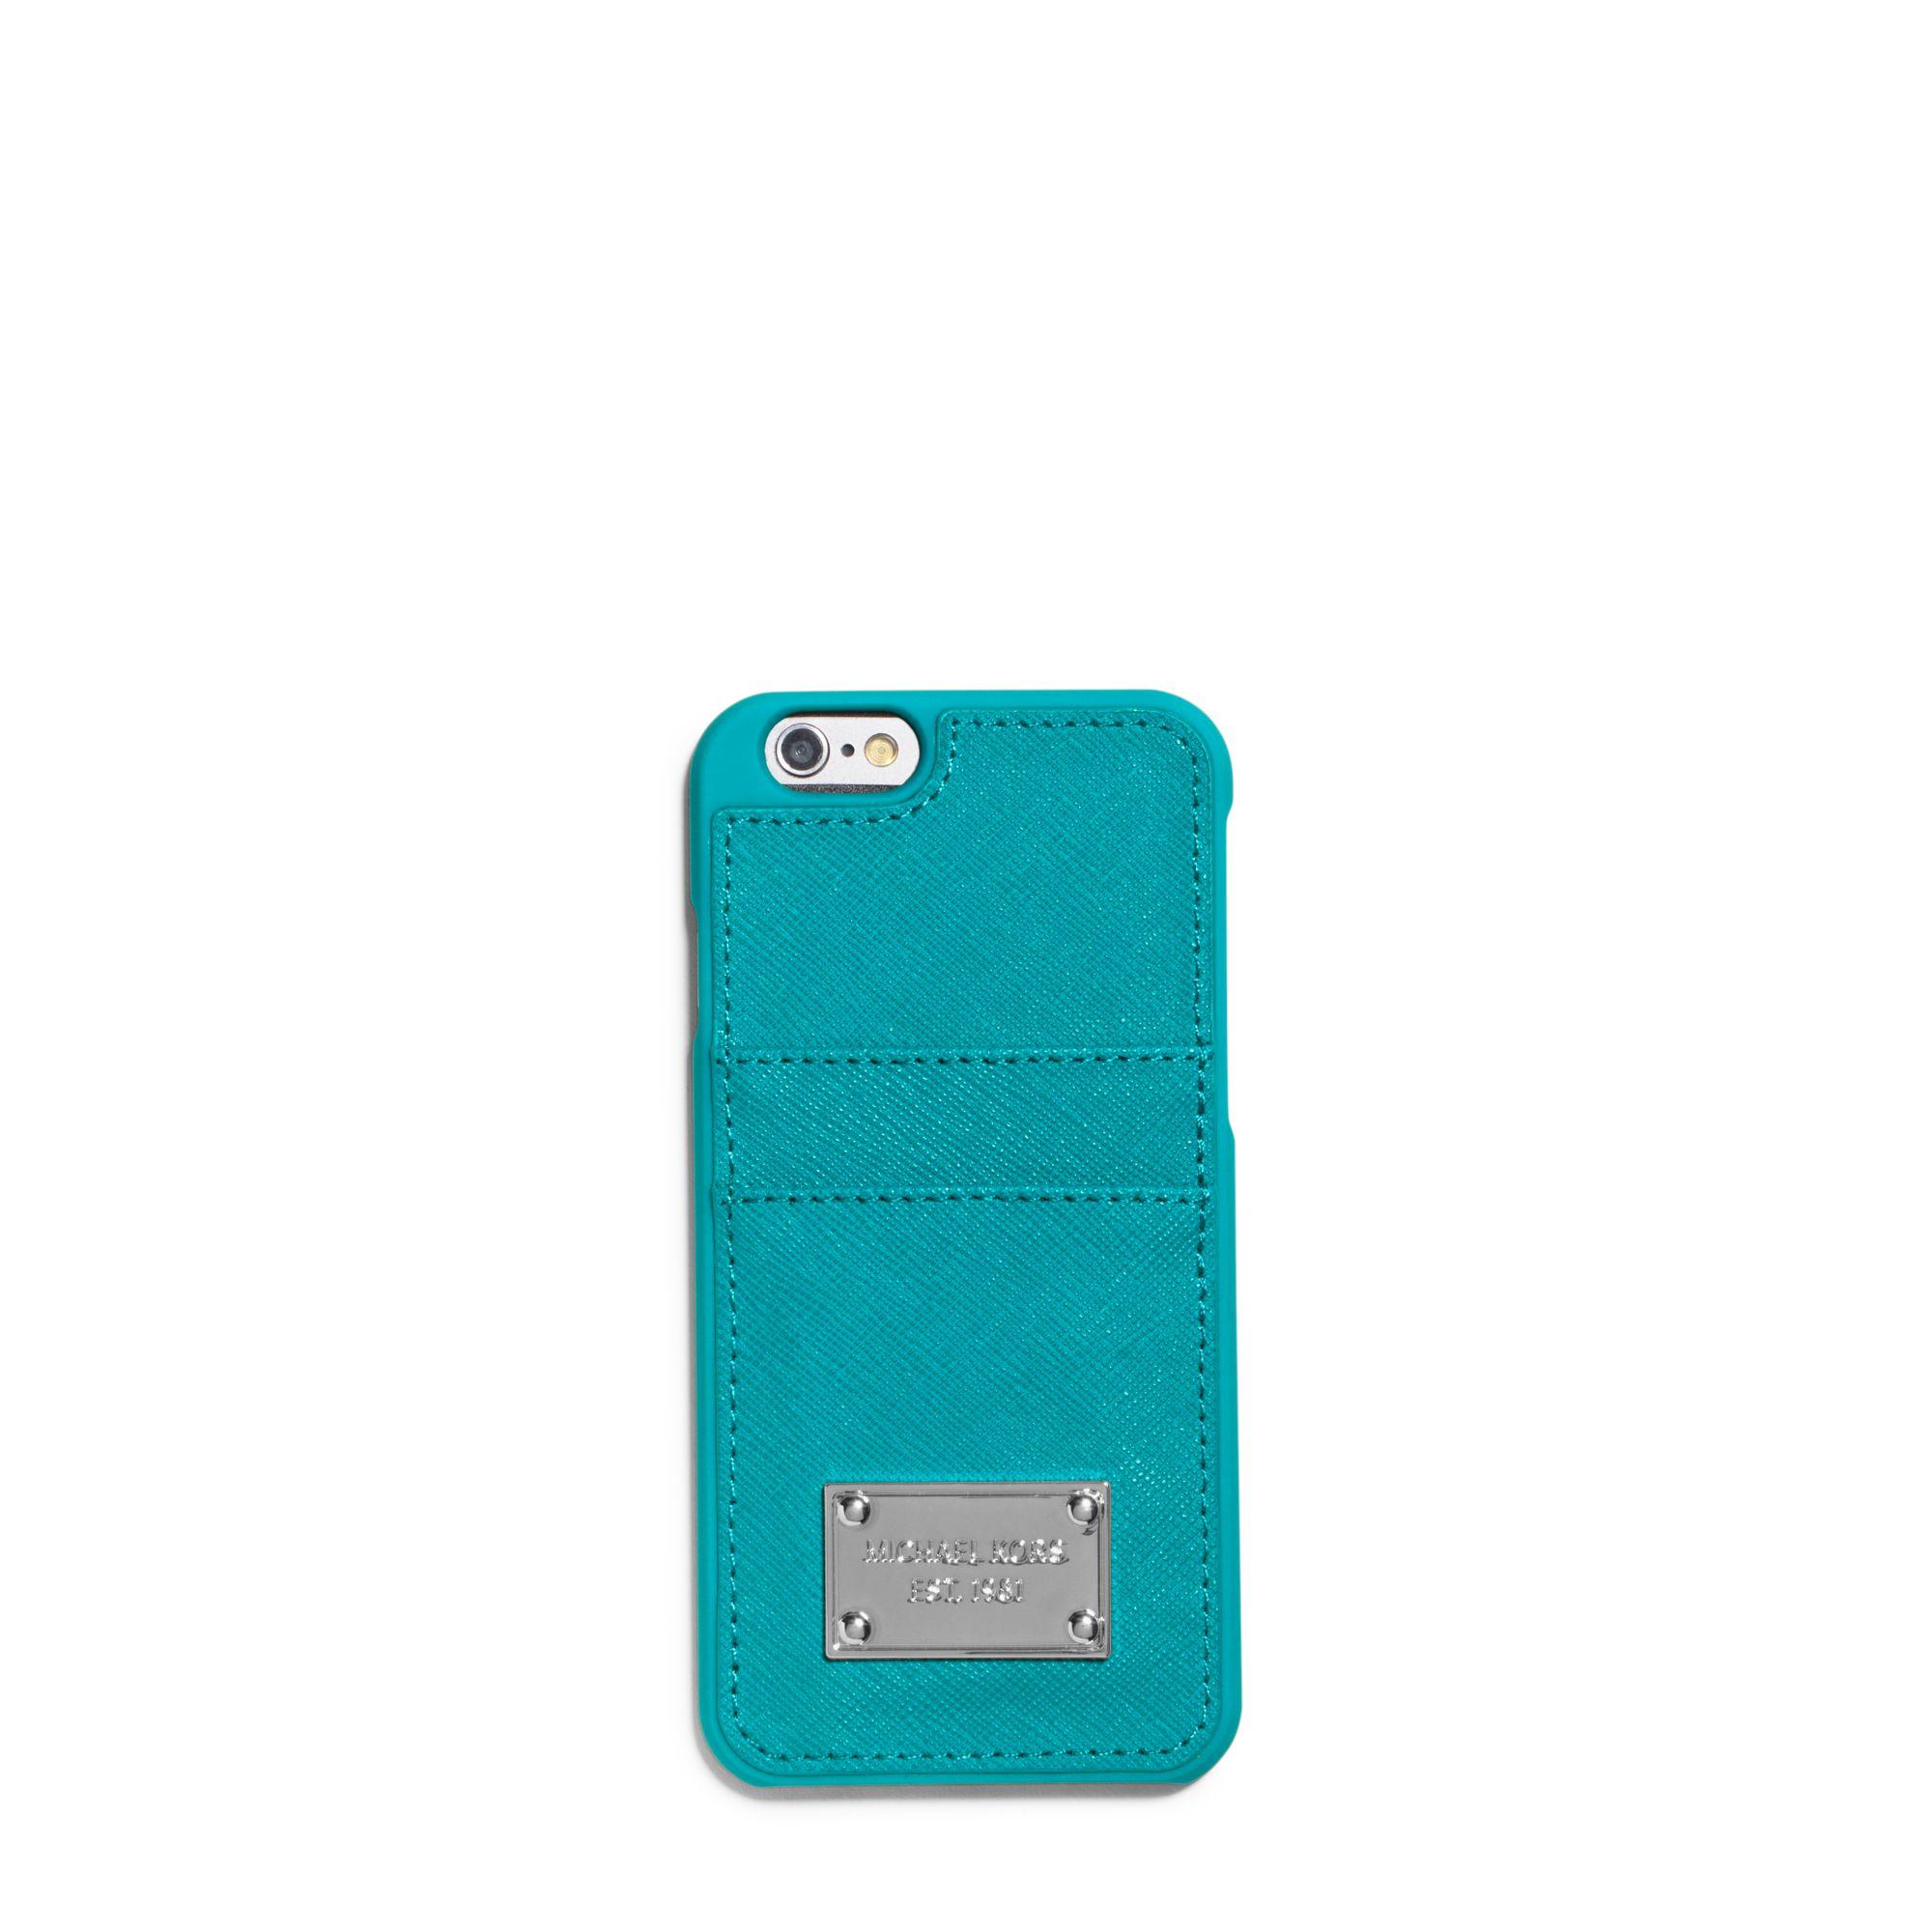 outlet store 3c771 1f521 Michael Kors Blue Saffiano Leather Pocket Smartphone Case